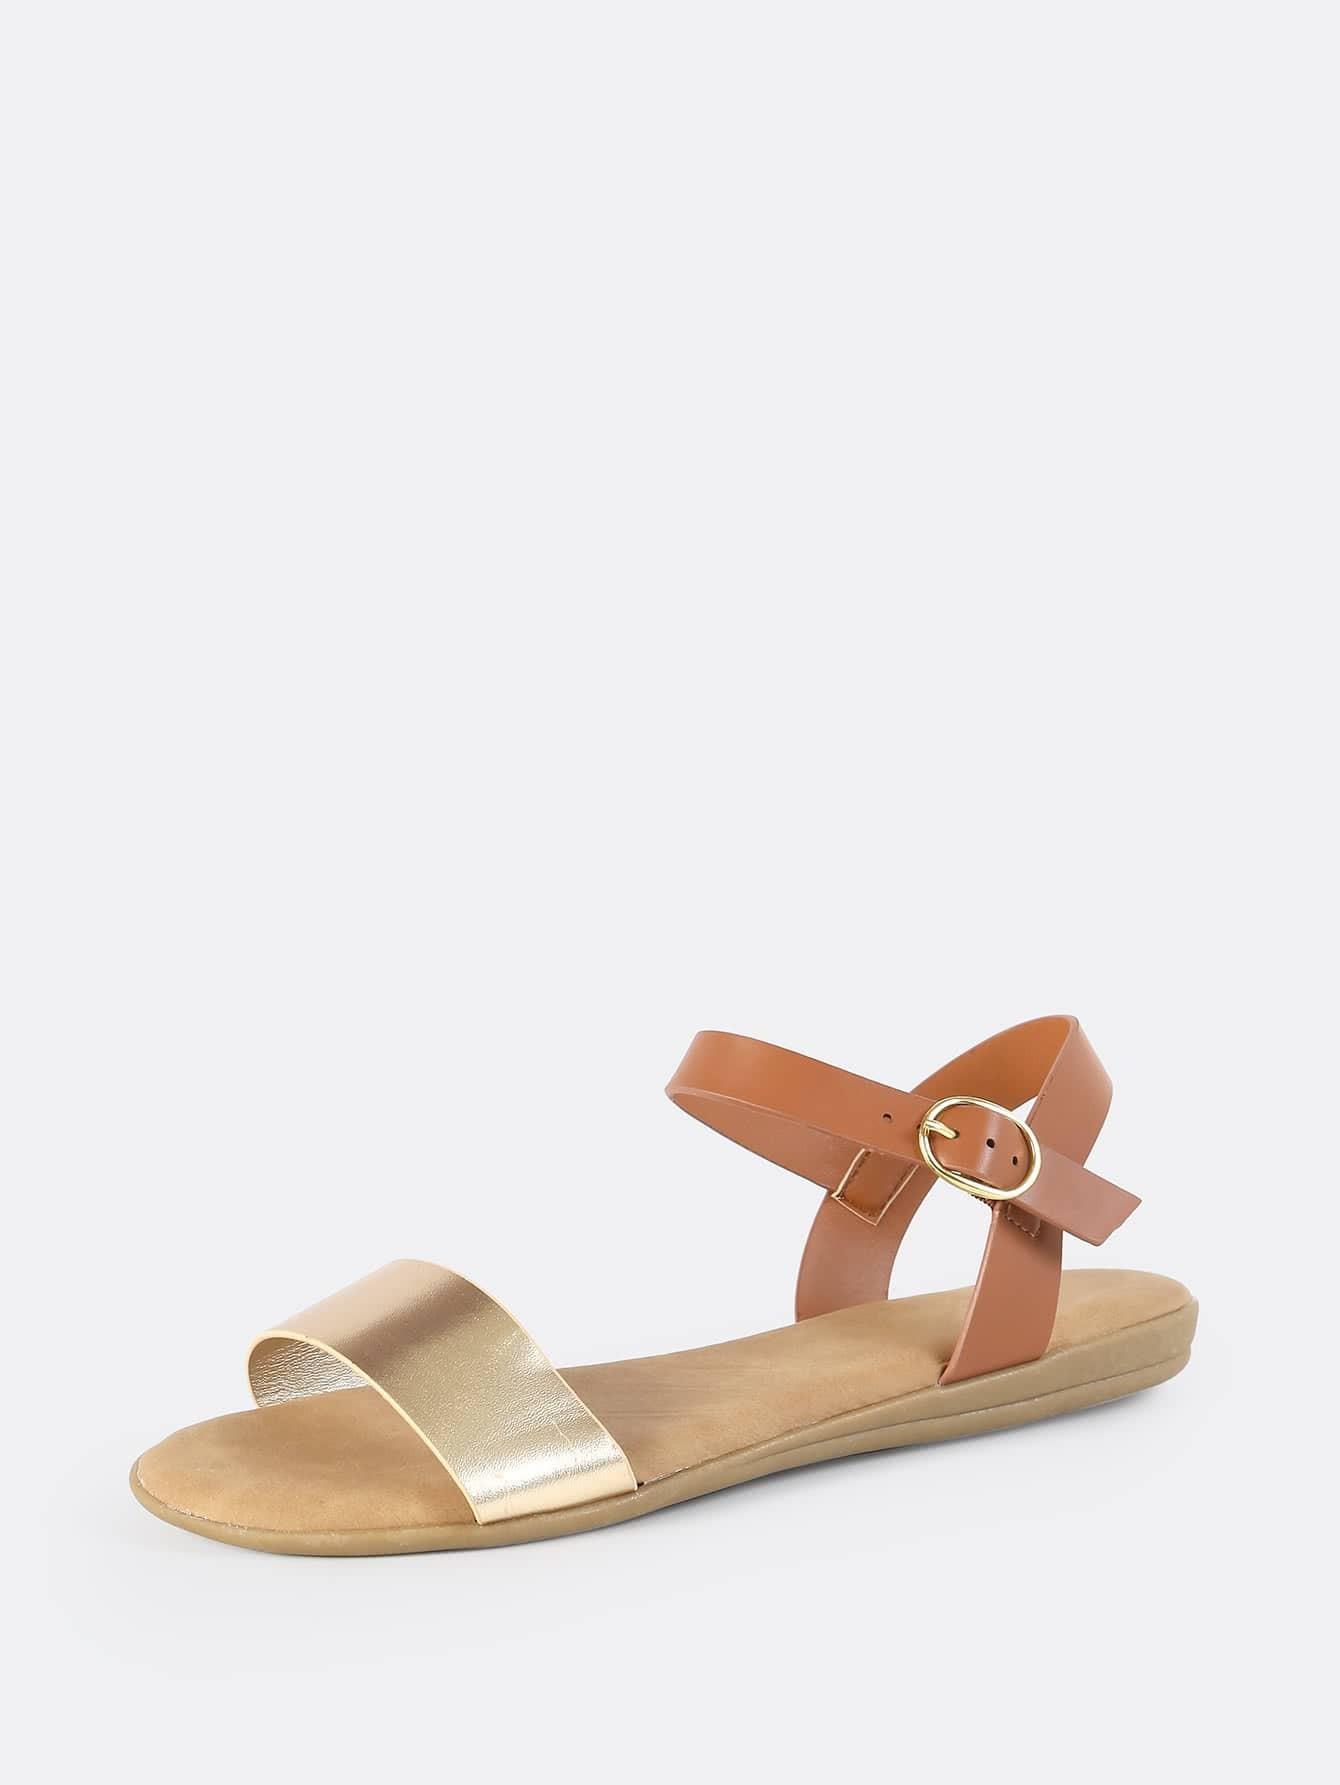 695b4f80ae1 Metallic Faux Leather Flat Sandals GOLD -SheIn(Sheinside)